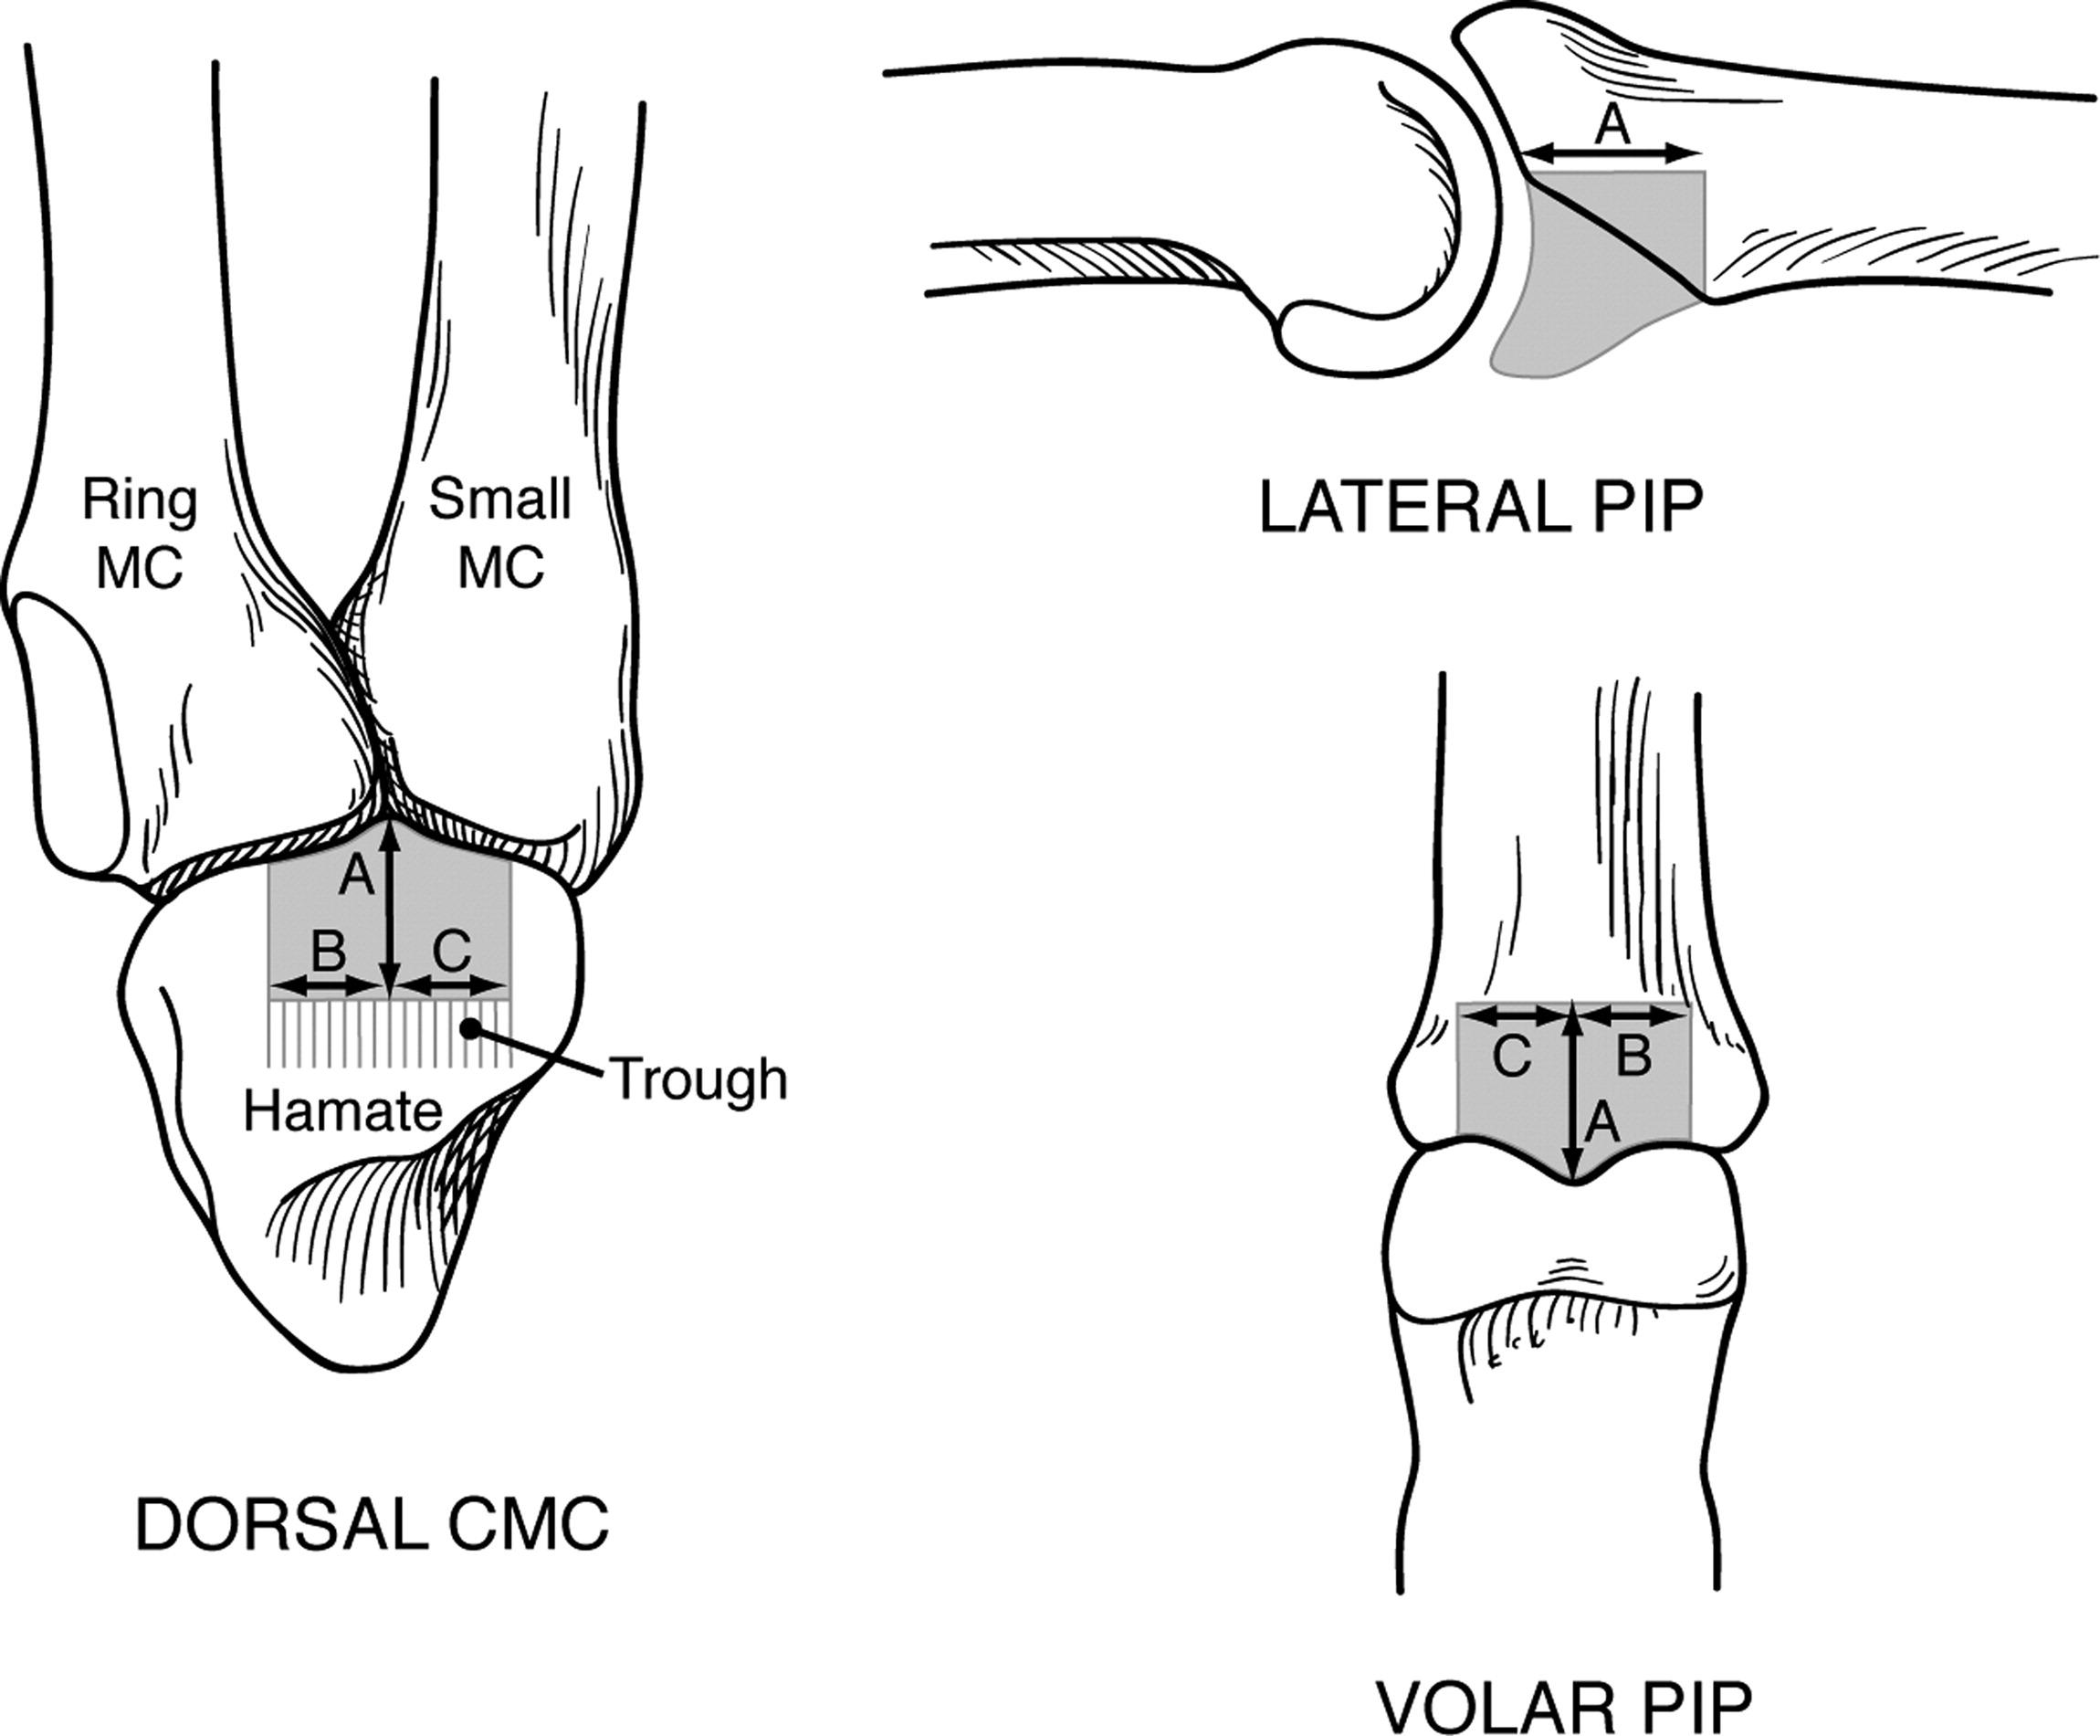 Hemi Hamate Arthroplasty Provides Functional Reconstruction Of Acute And Chronic Proximal